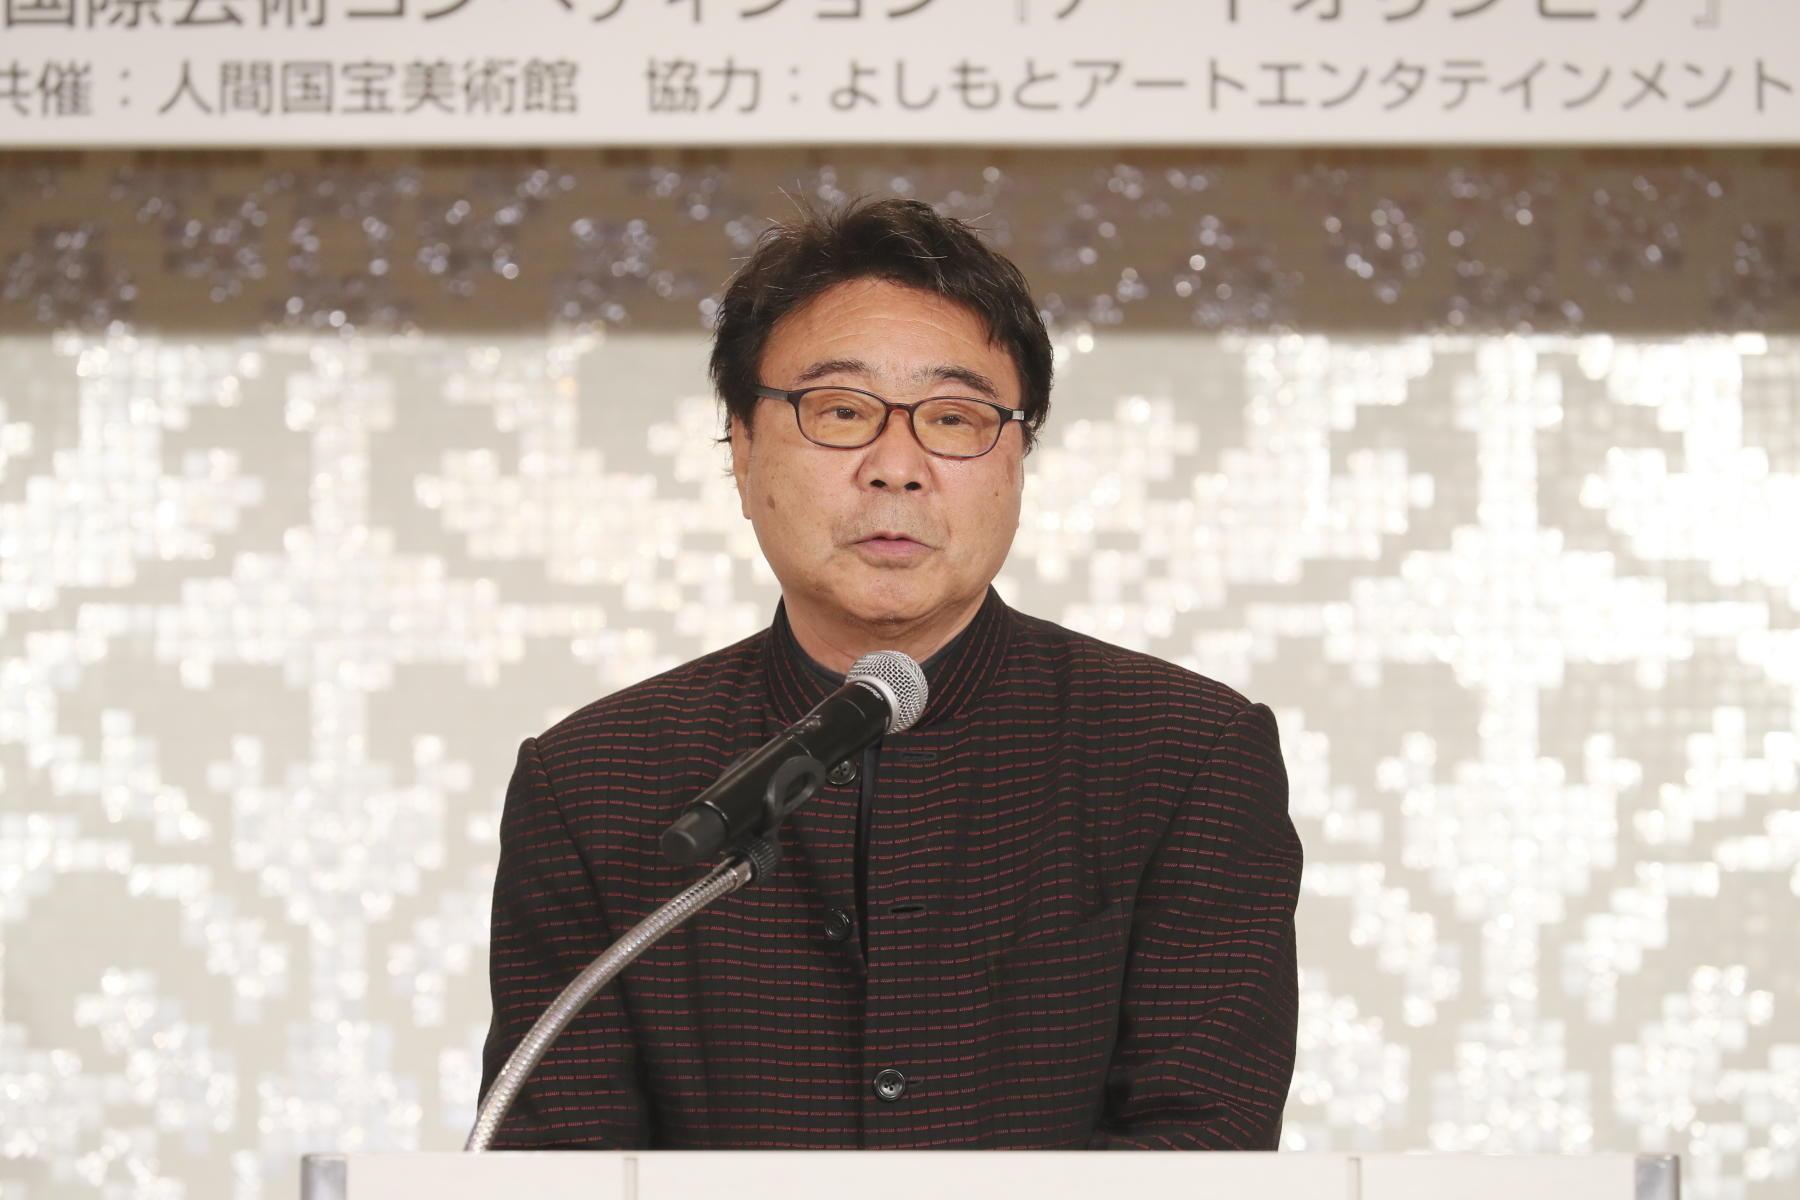 http://news.yoshimoto.co.jp/20181116153153-8f7c2a6889b922883b8e9fed0b7b8d0c15c66d81.jpg